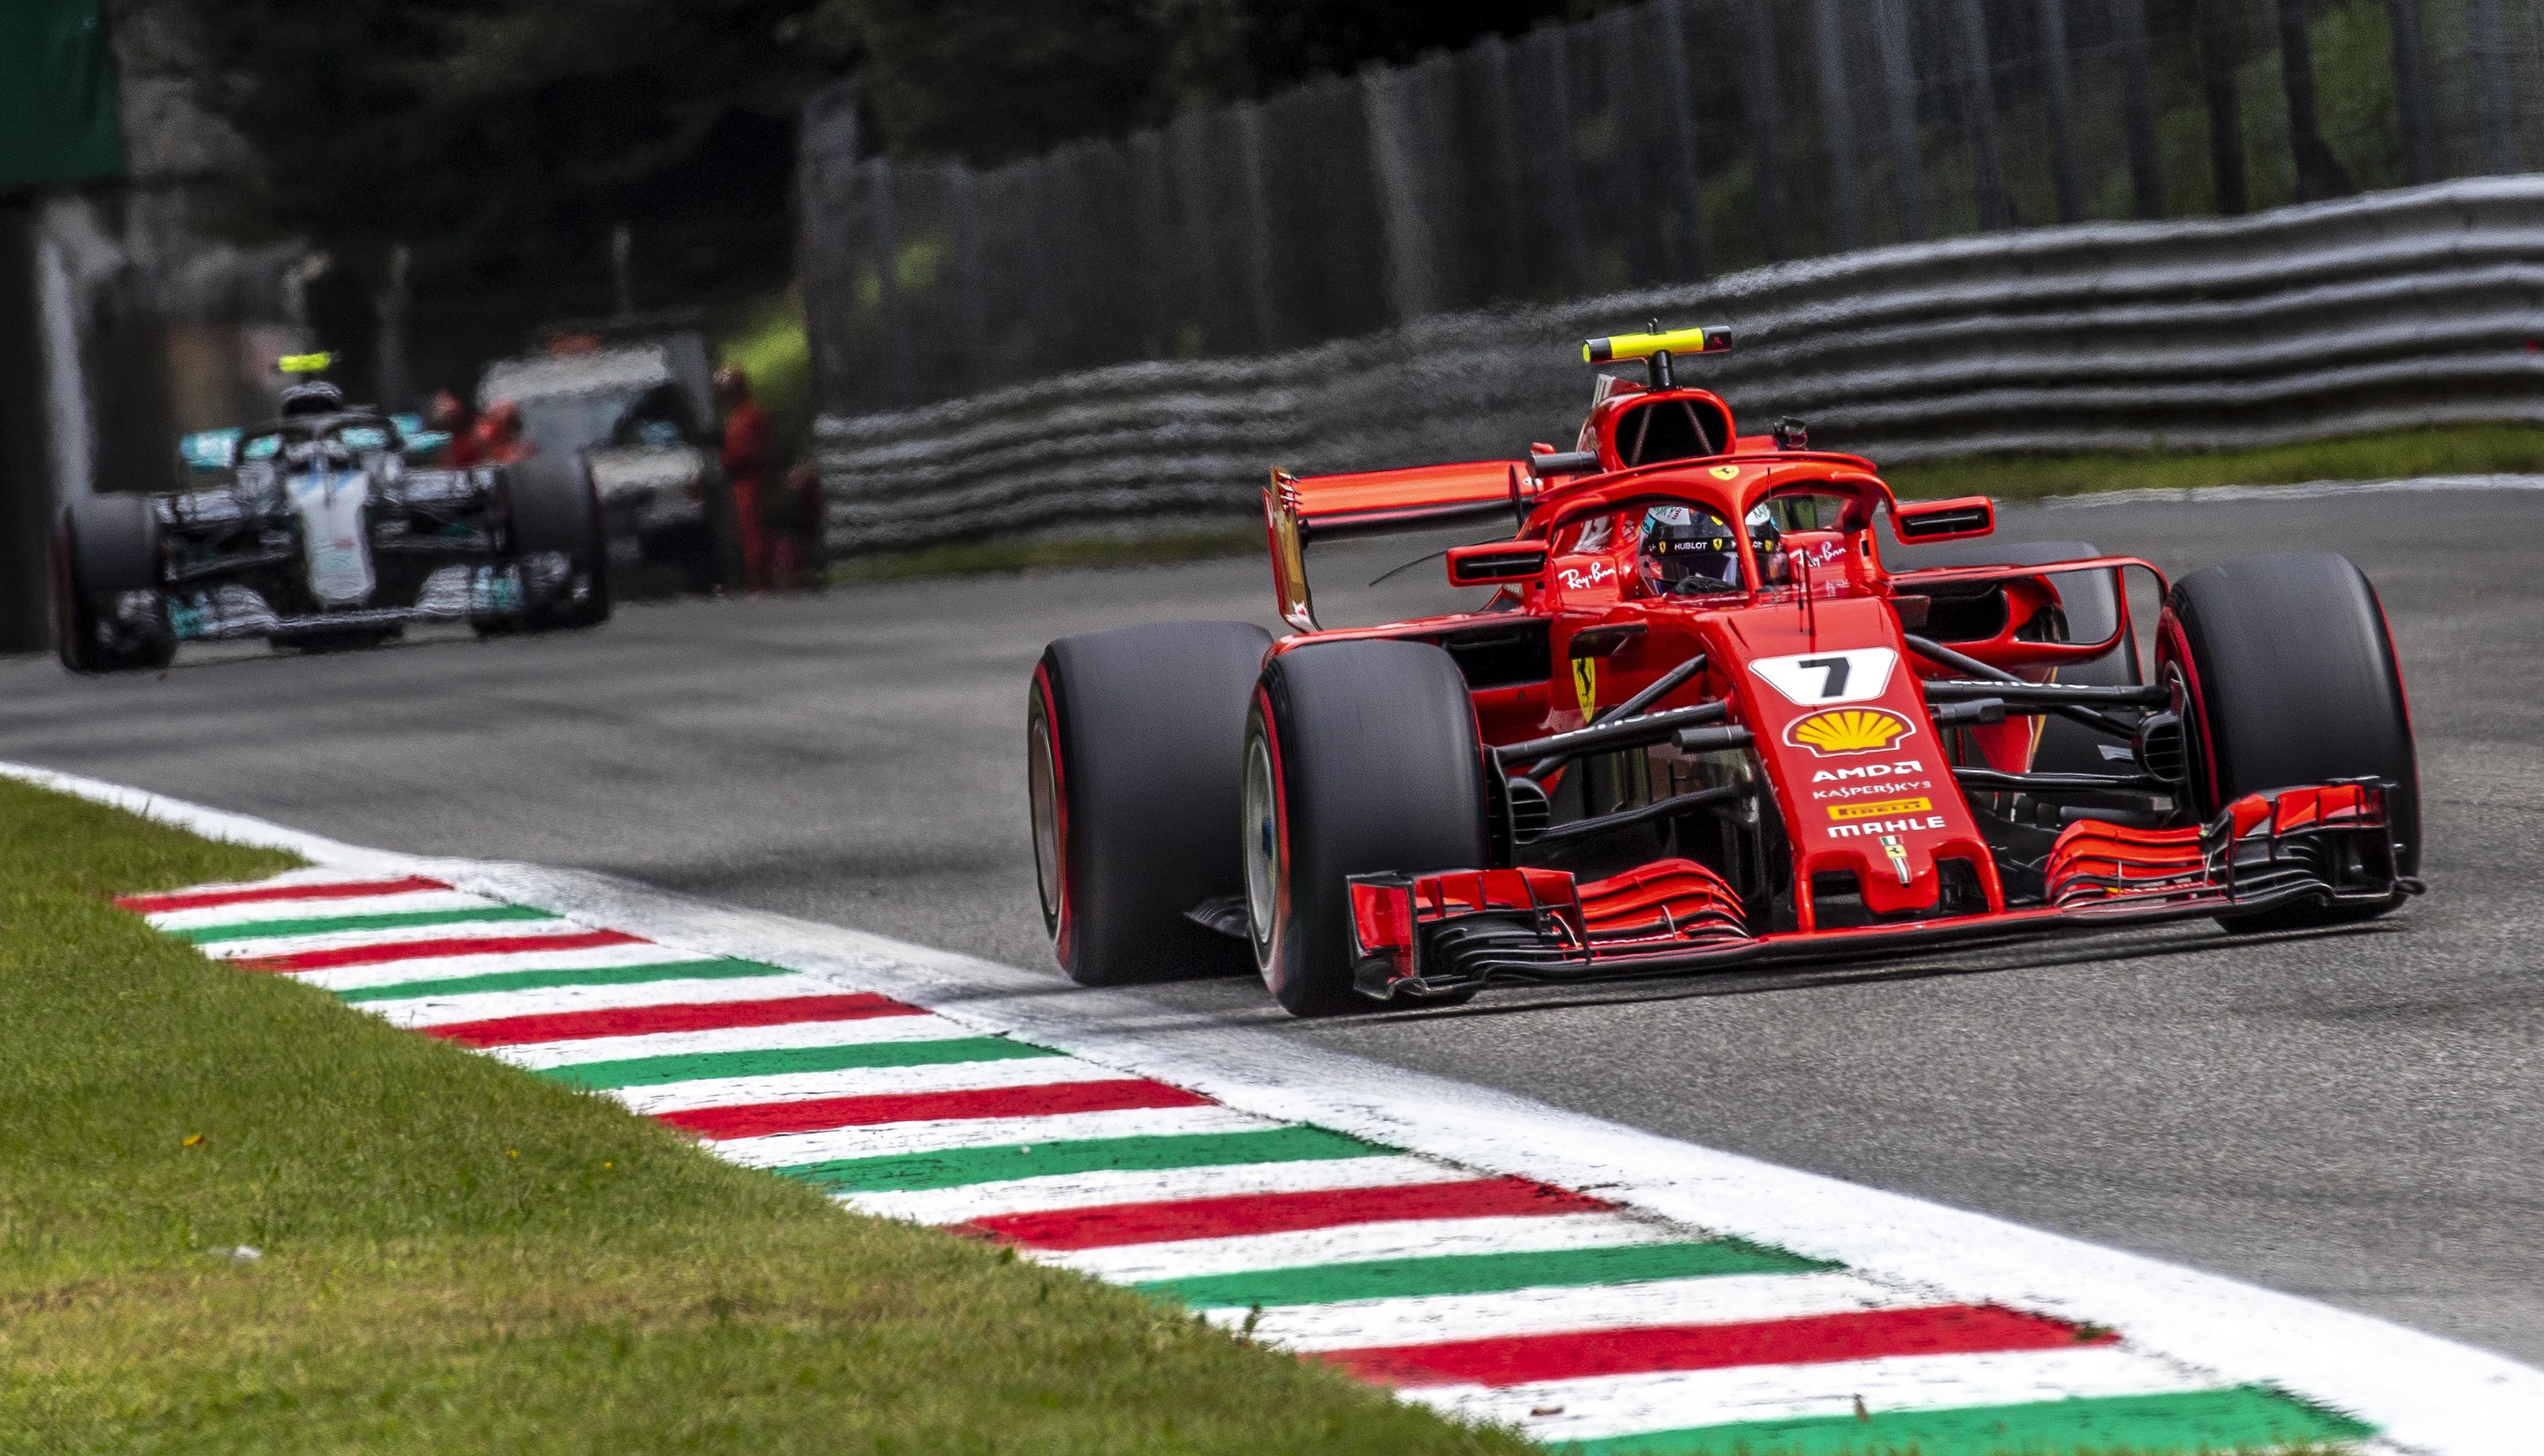 Kimi Raikkonen finished quickest to take pole in the Italian GP qualifying